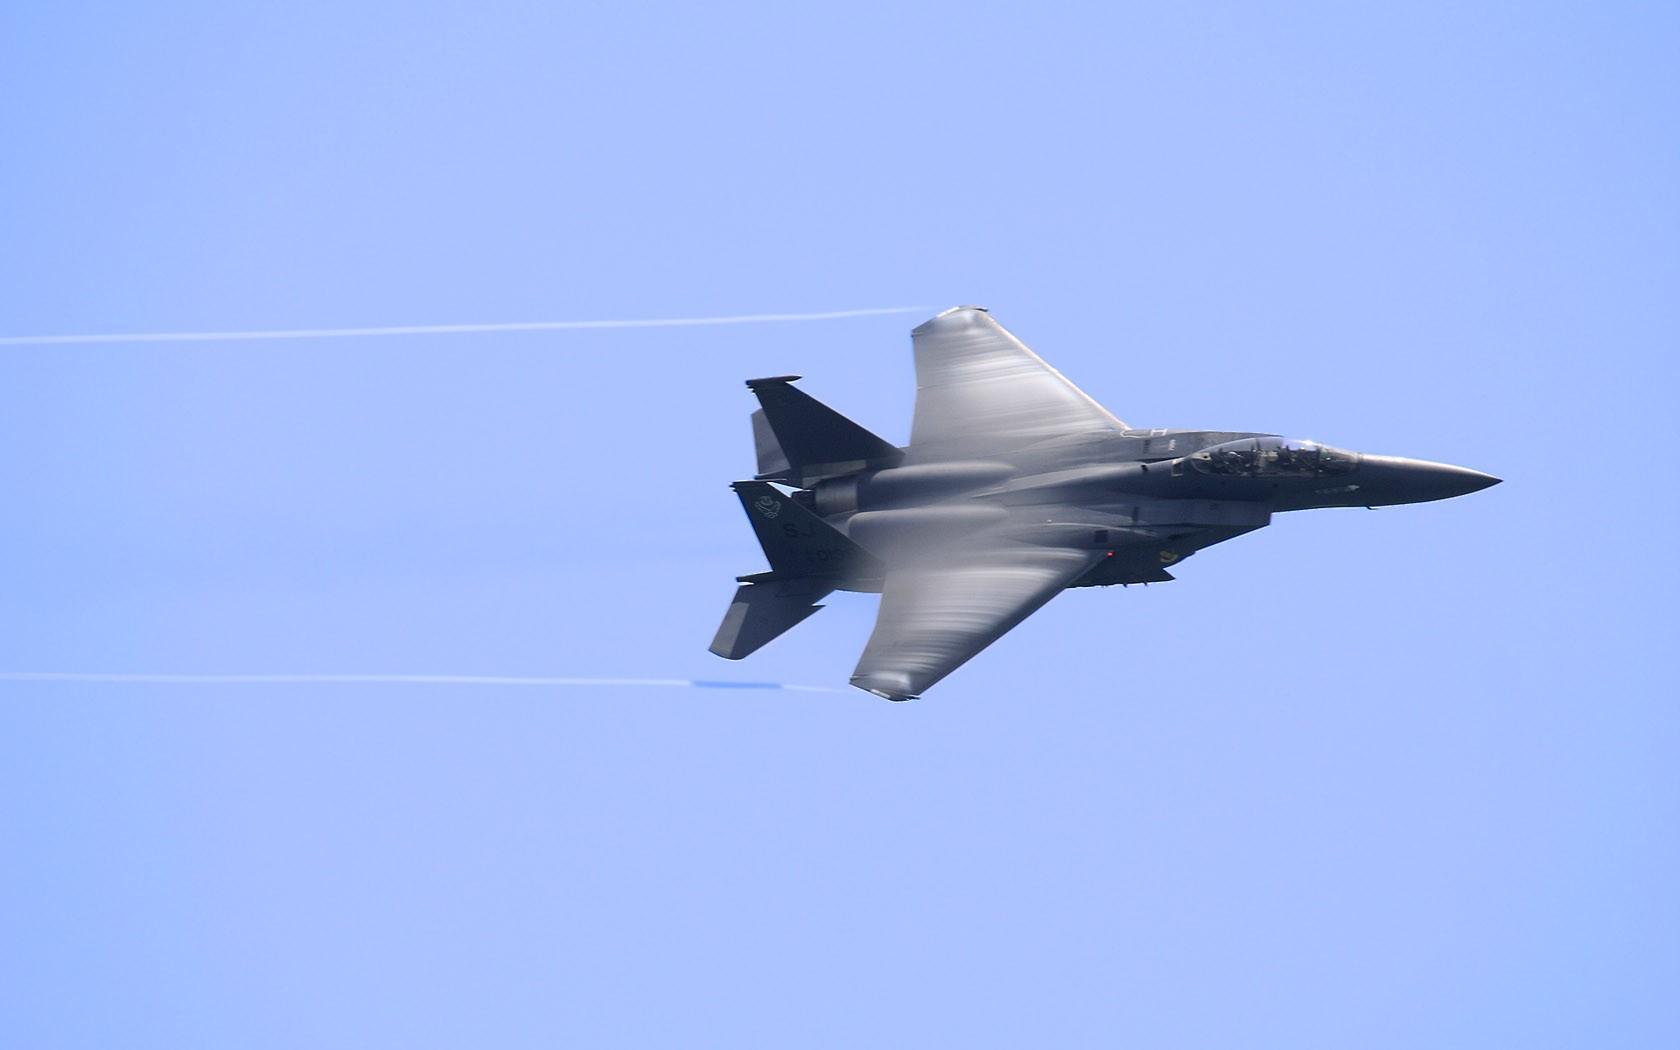 Wallpaper : vehicle, airplane, military aircraft, Dassault Rafale